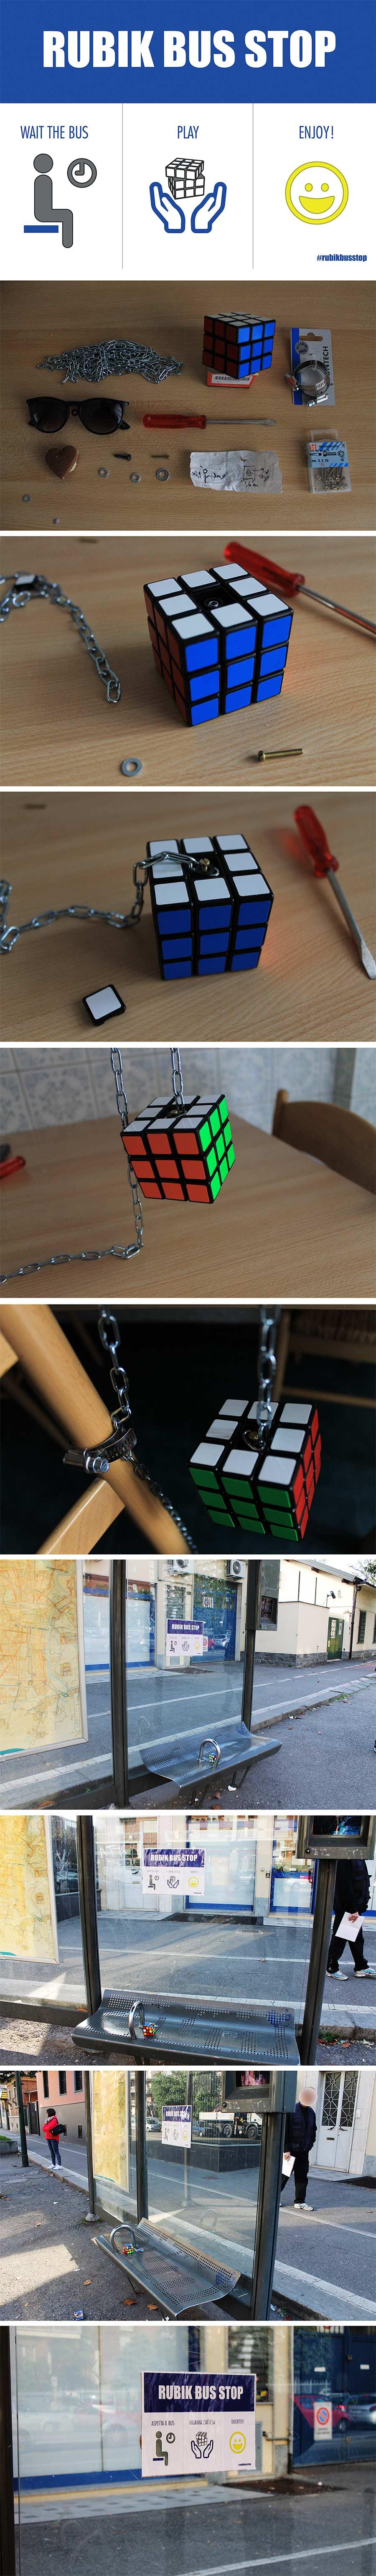 Bushaltestelle mit Rubik's Cube rubik-bus-stop_02